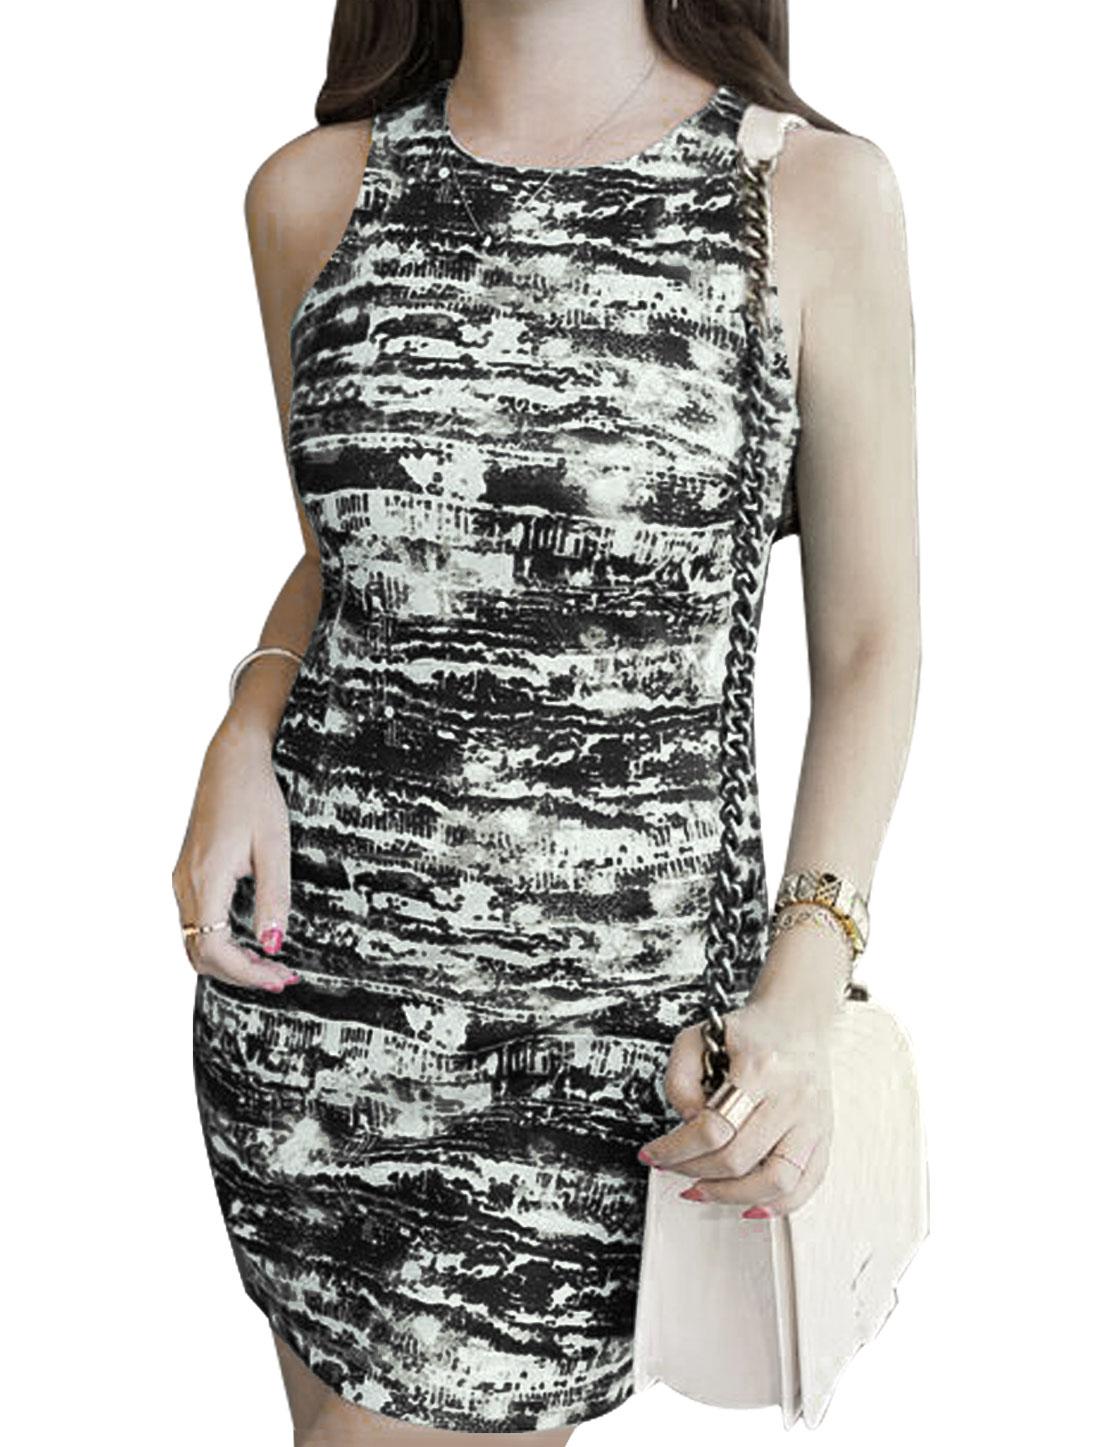 Woman Novelty Prints Halter Neck Sleeveless Unlined Sheath Dress Ebony M